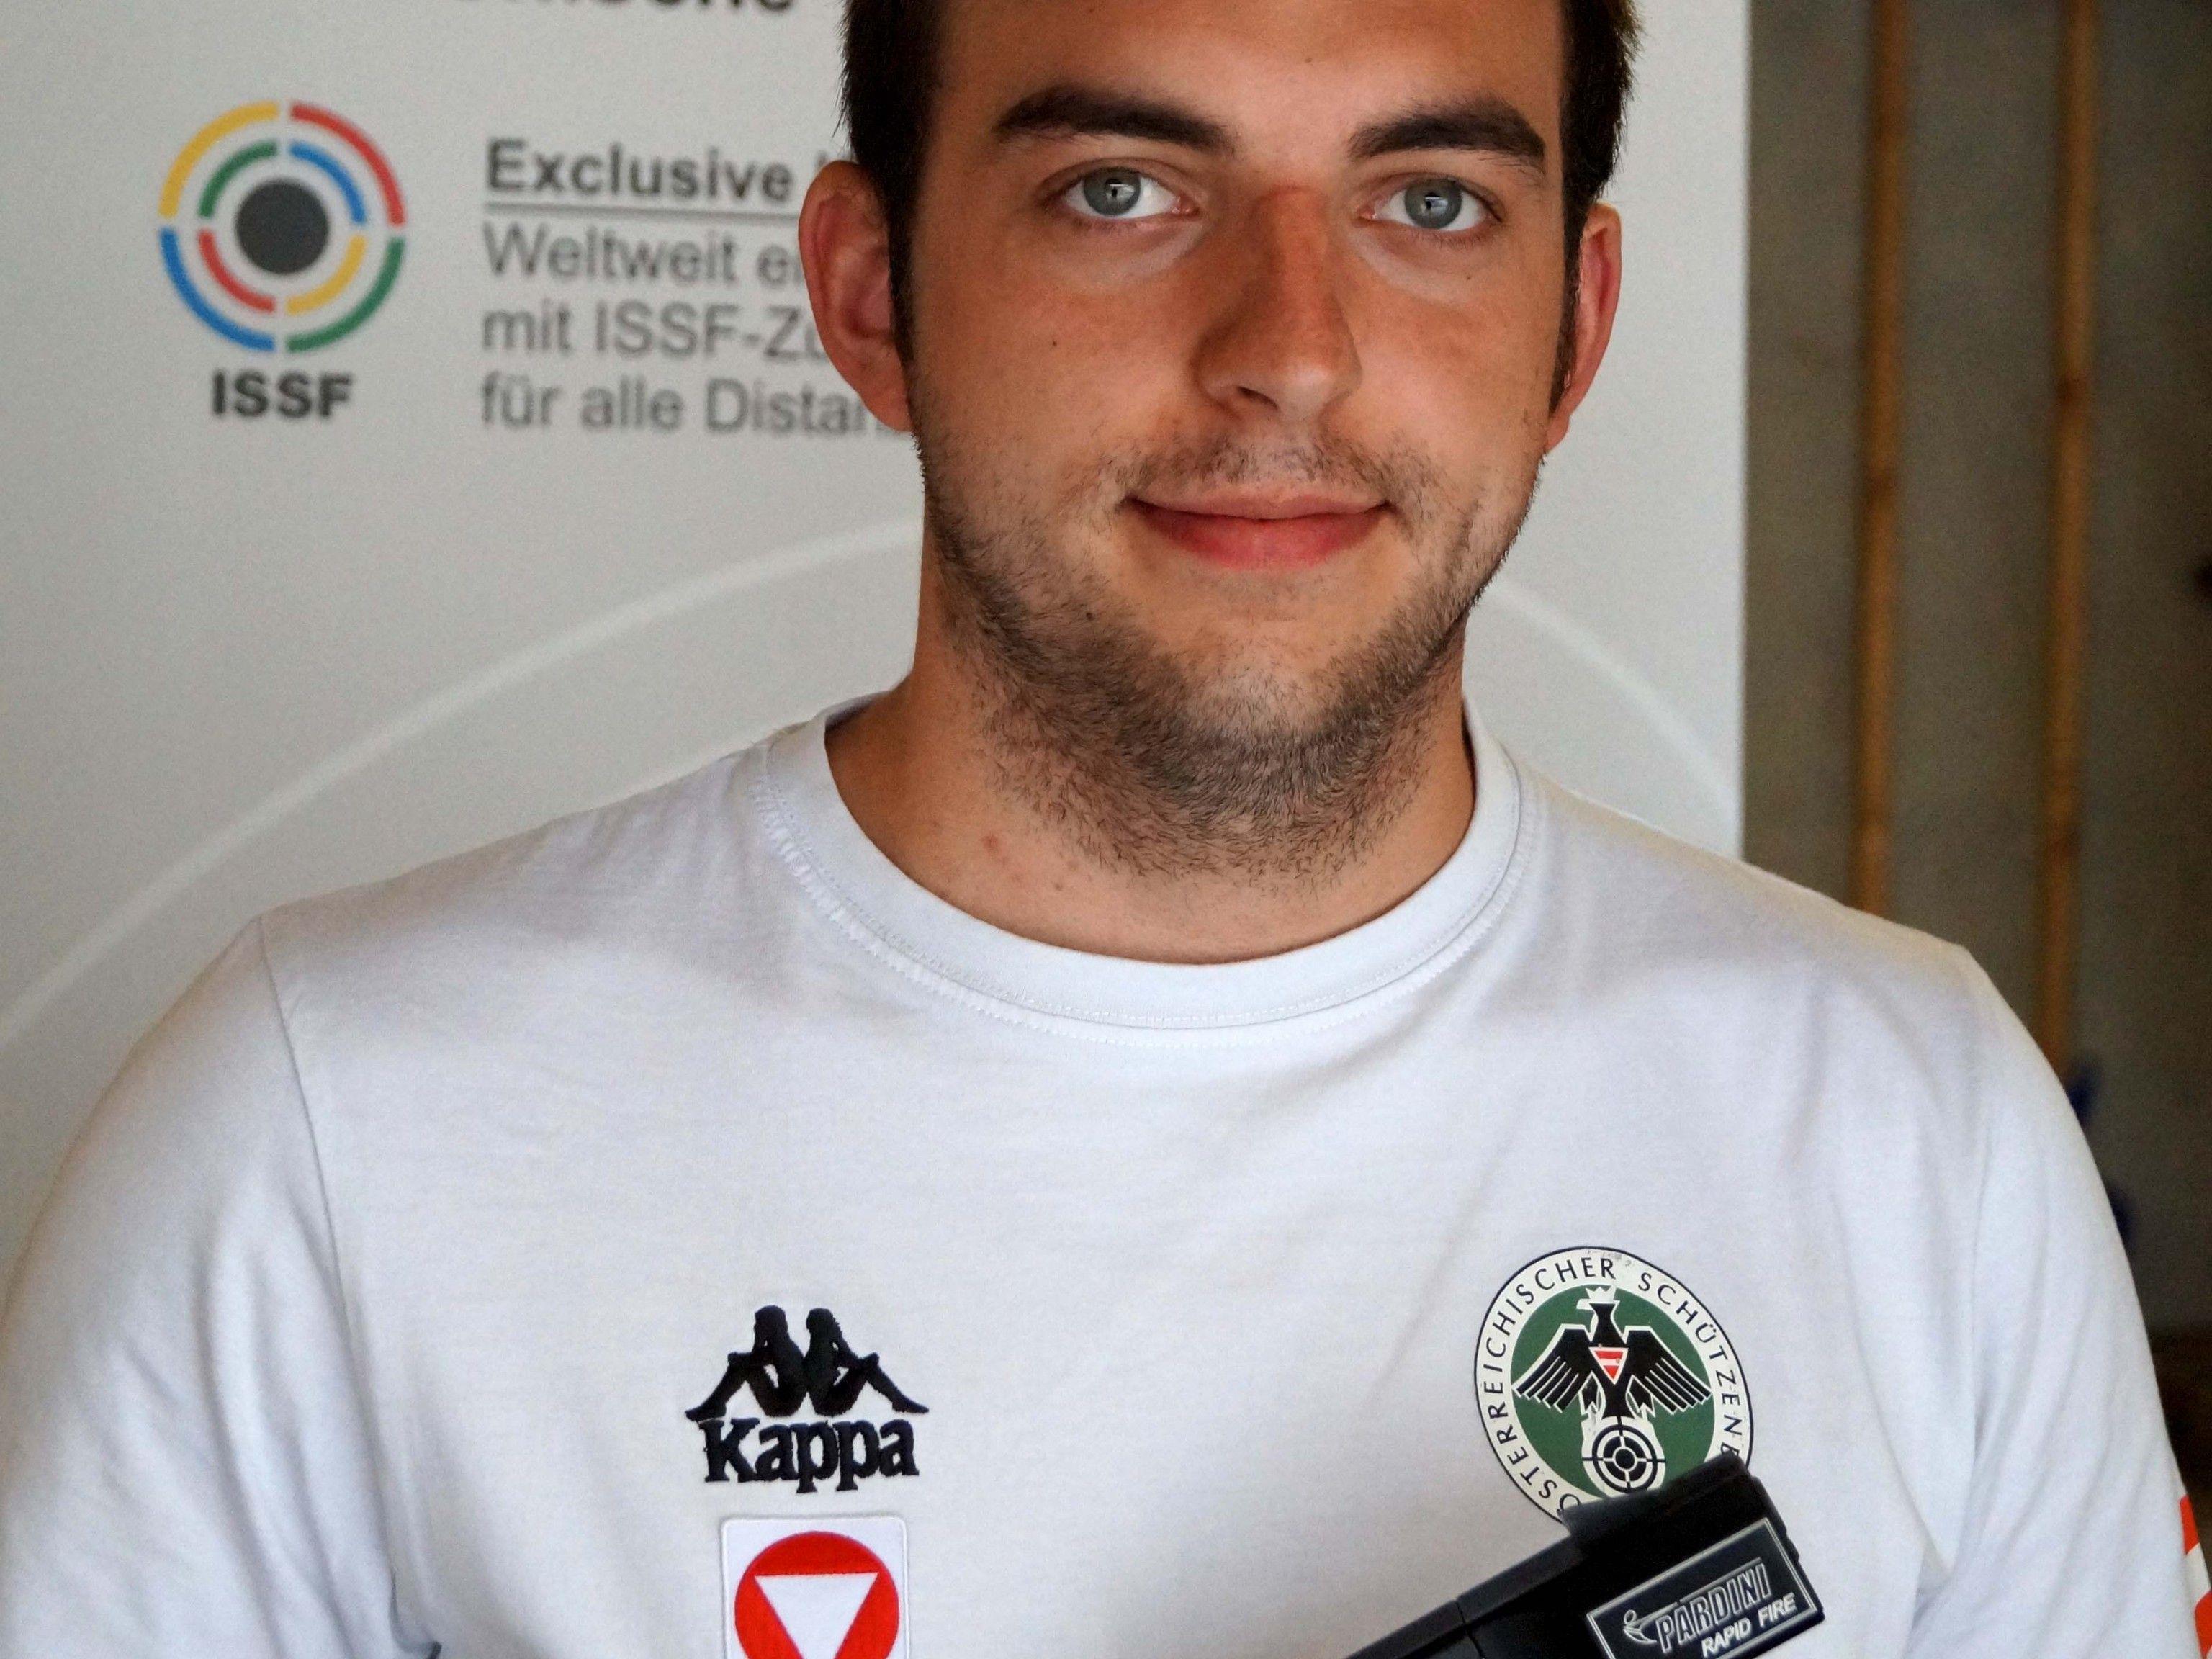 Christoph Tiefenthaler